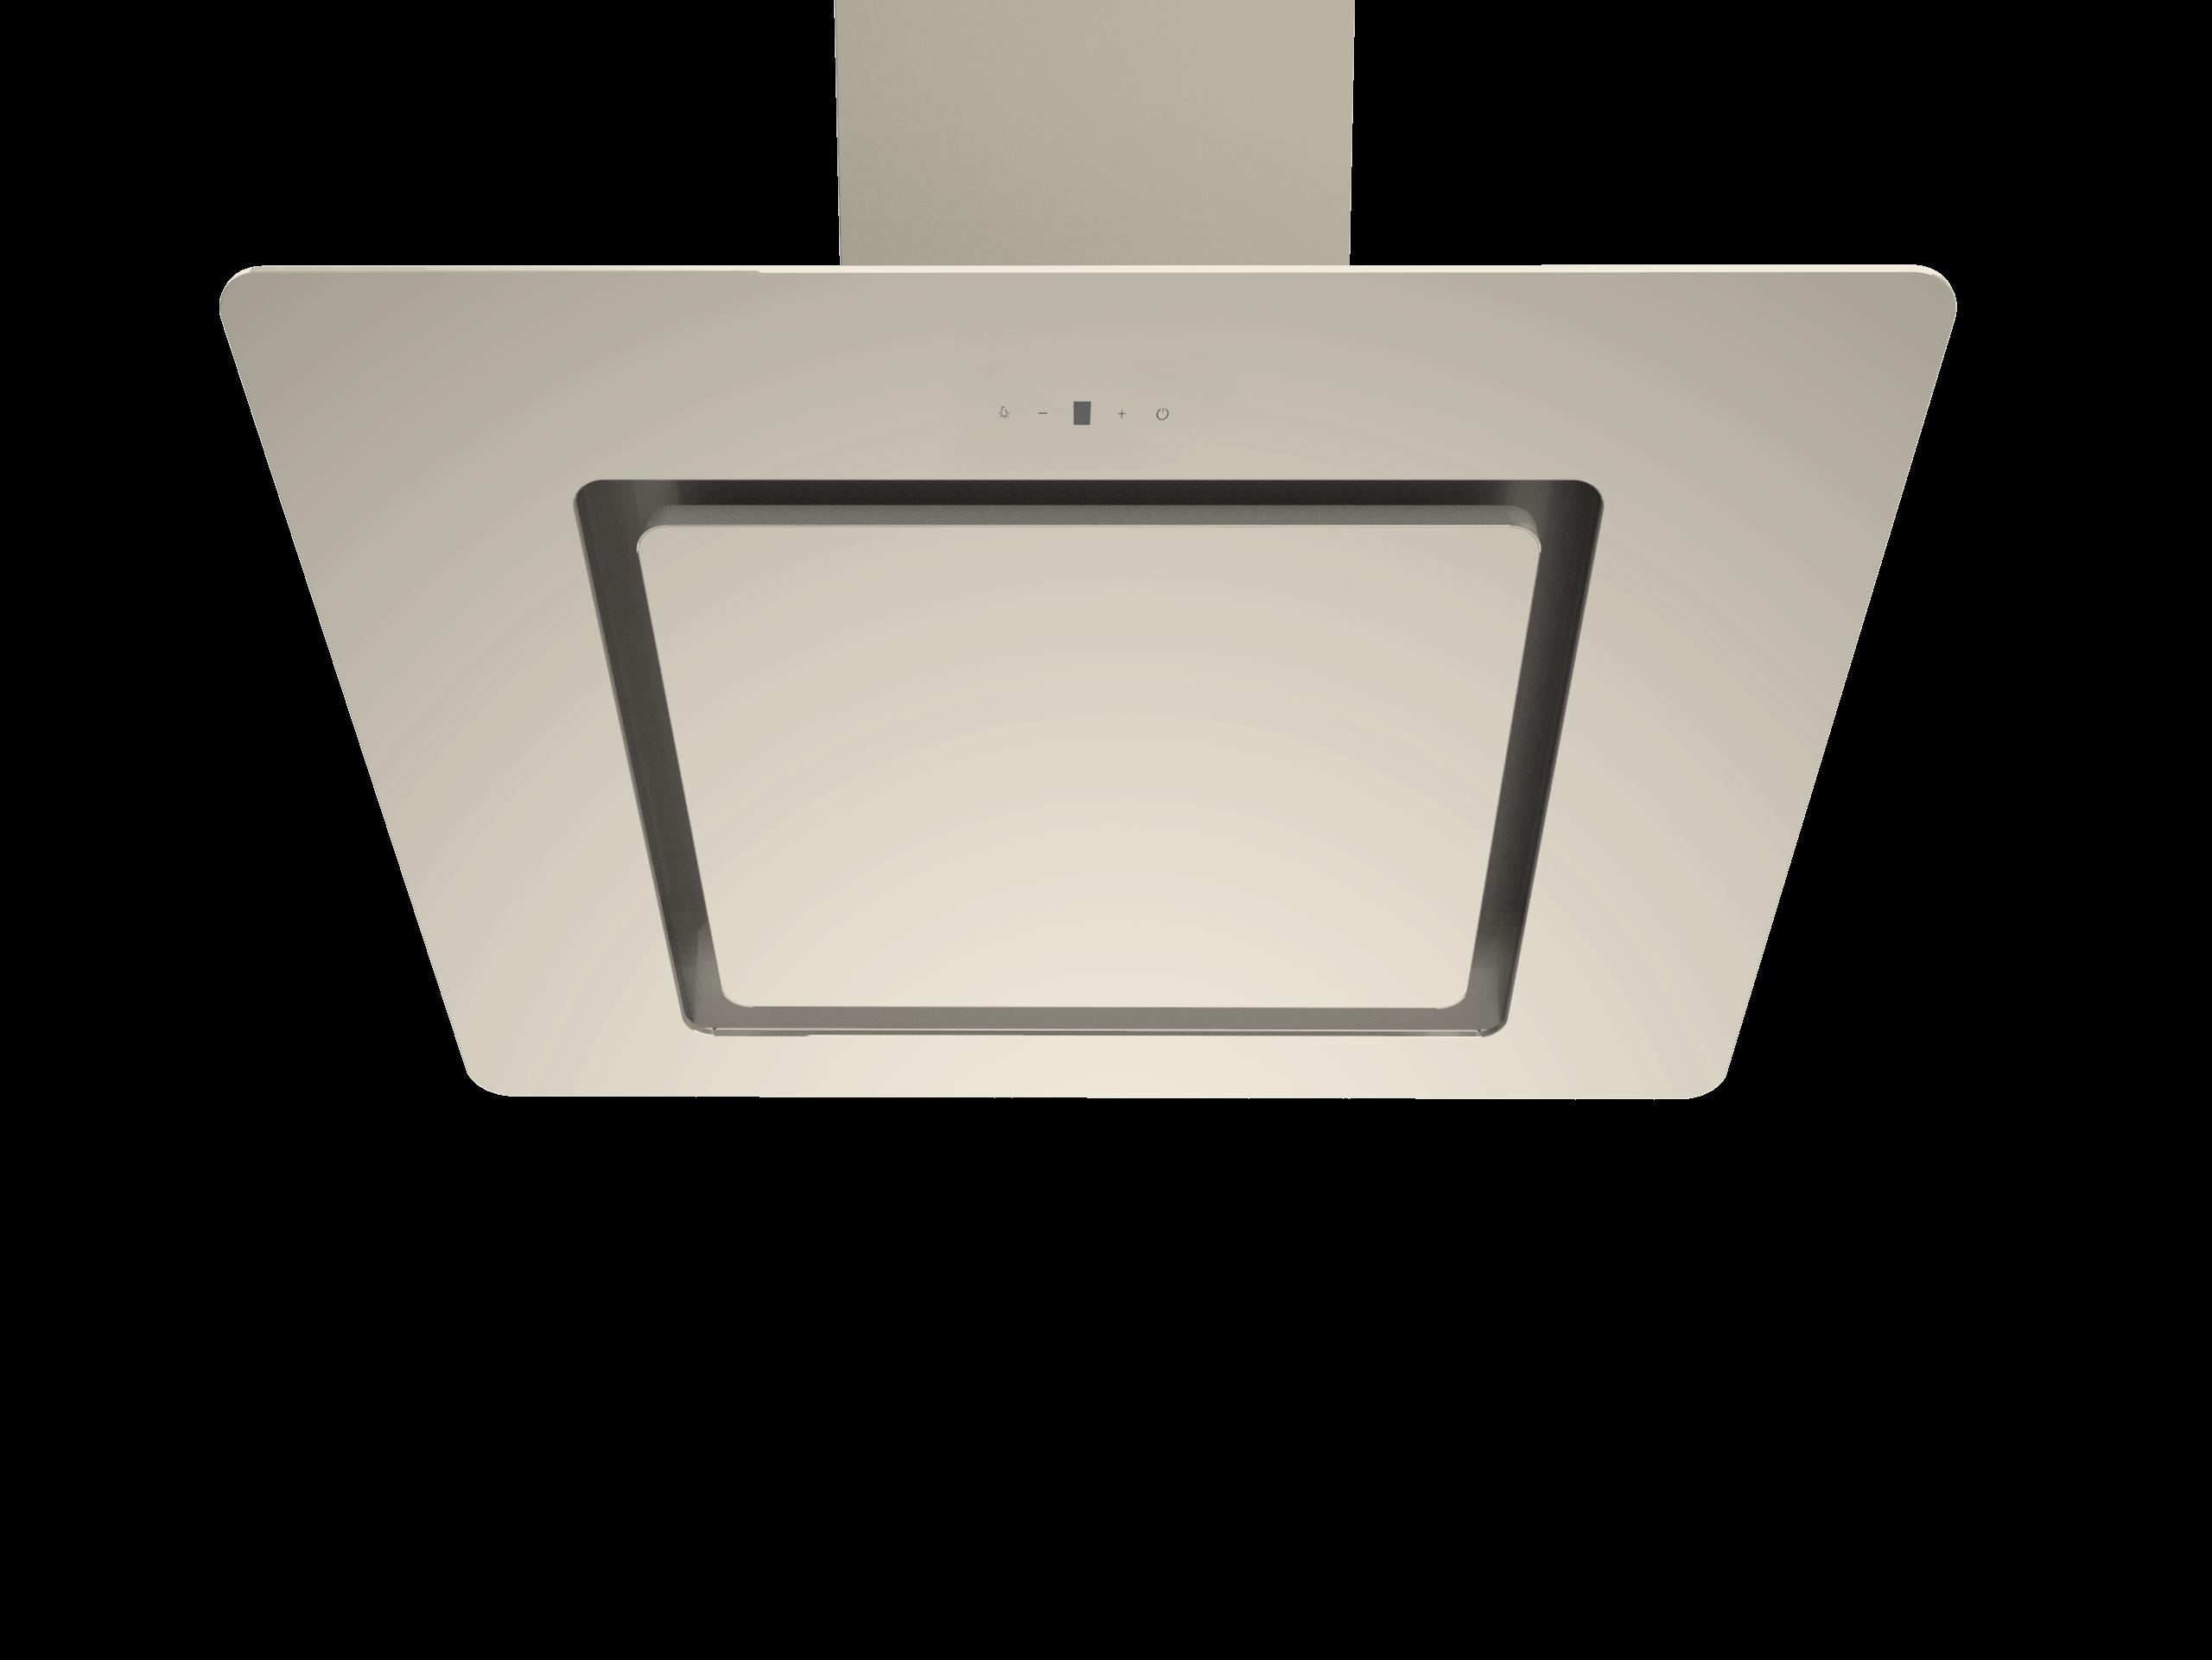 Вытяжка кухонная Midea MH60AN350GI